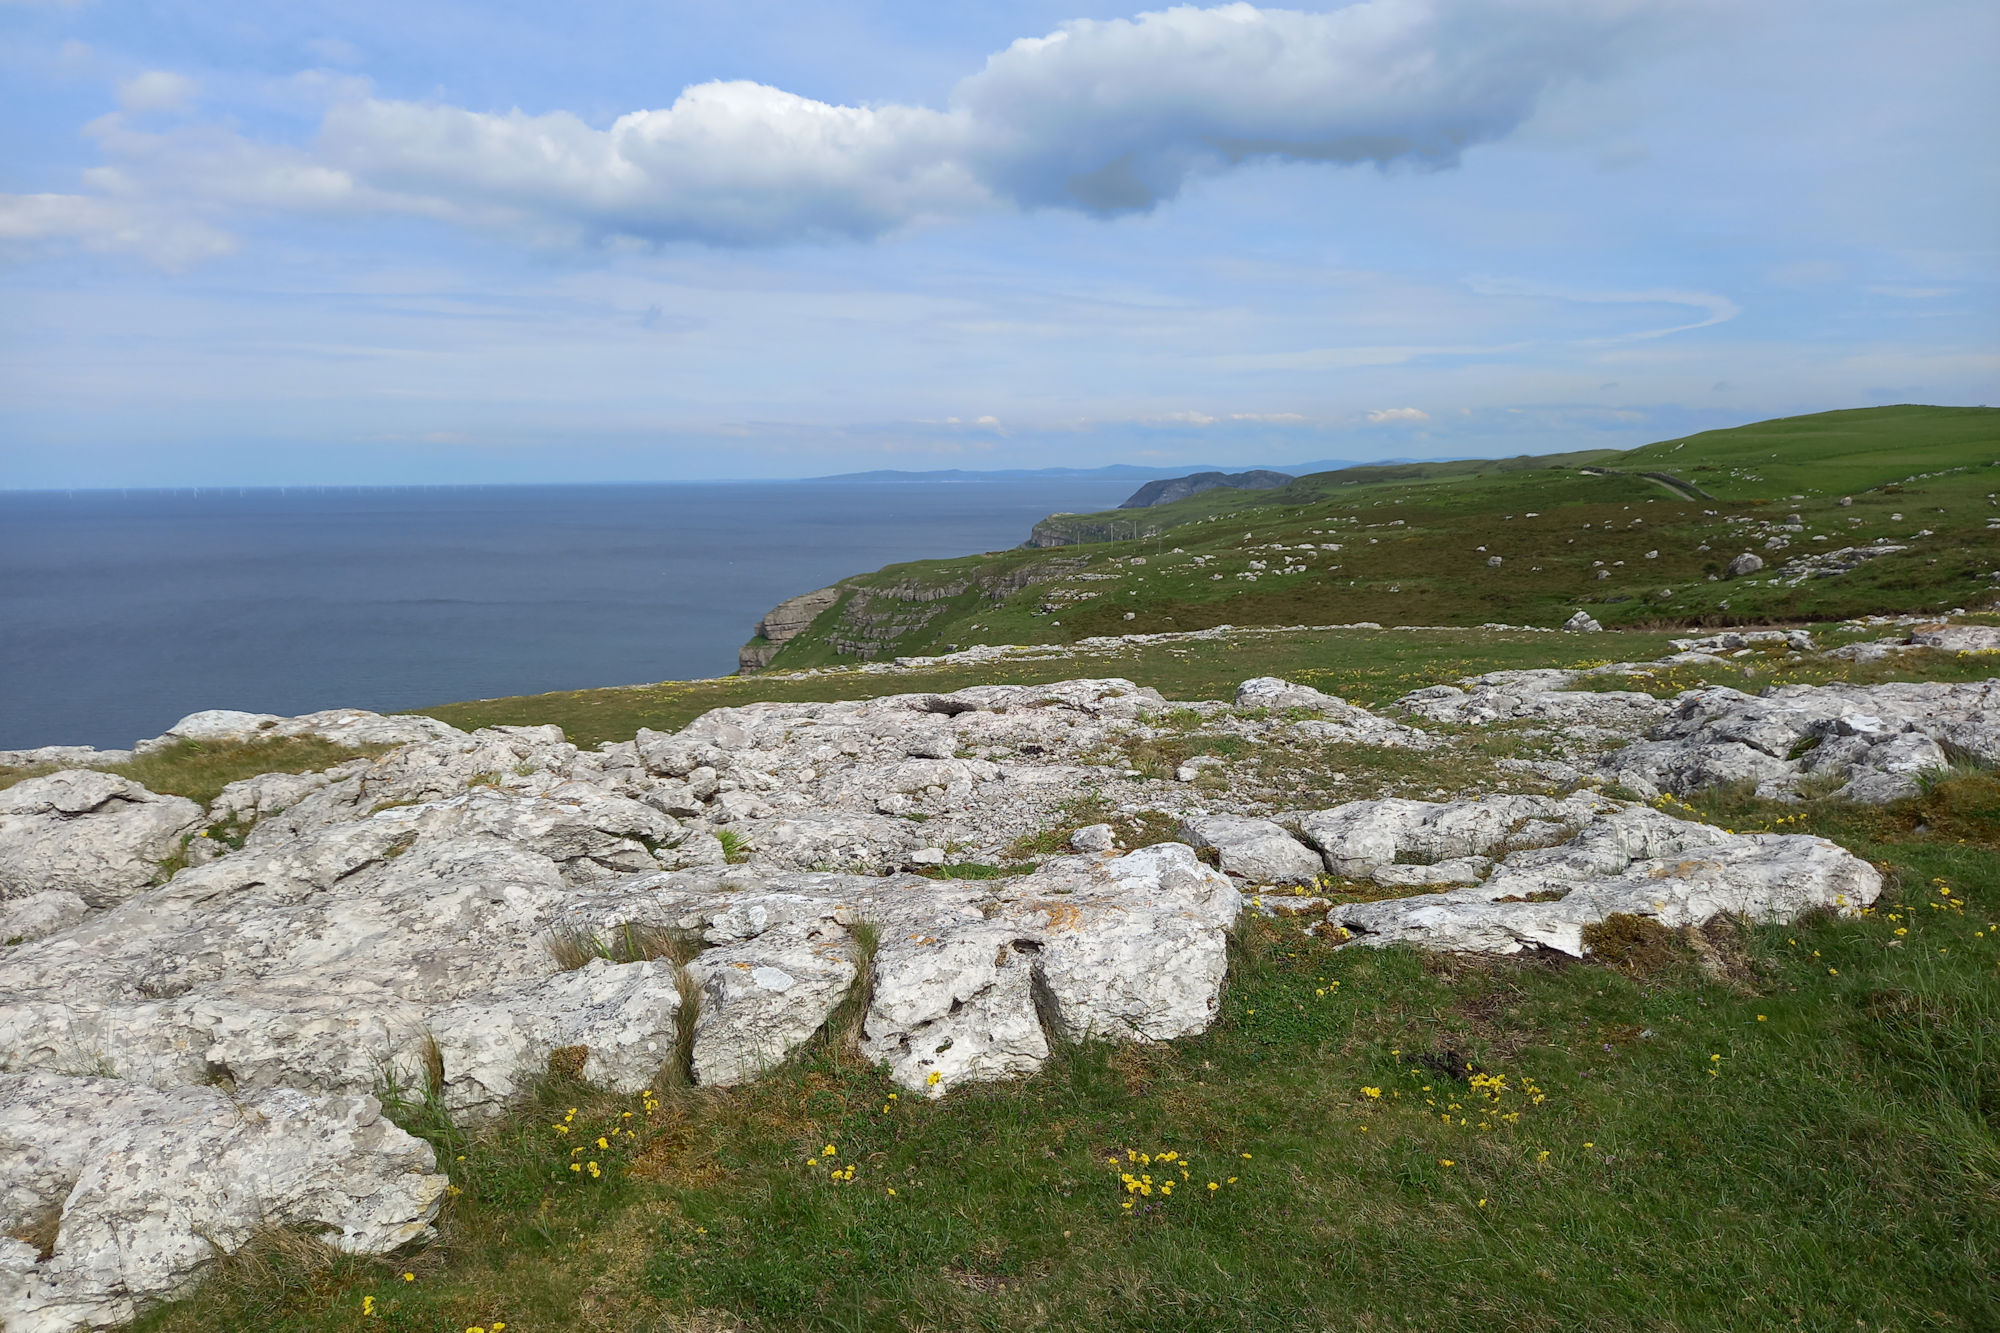 Limestone headland